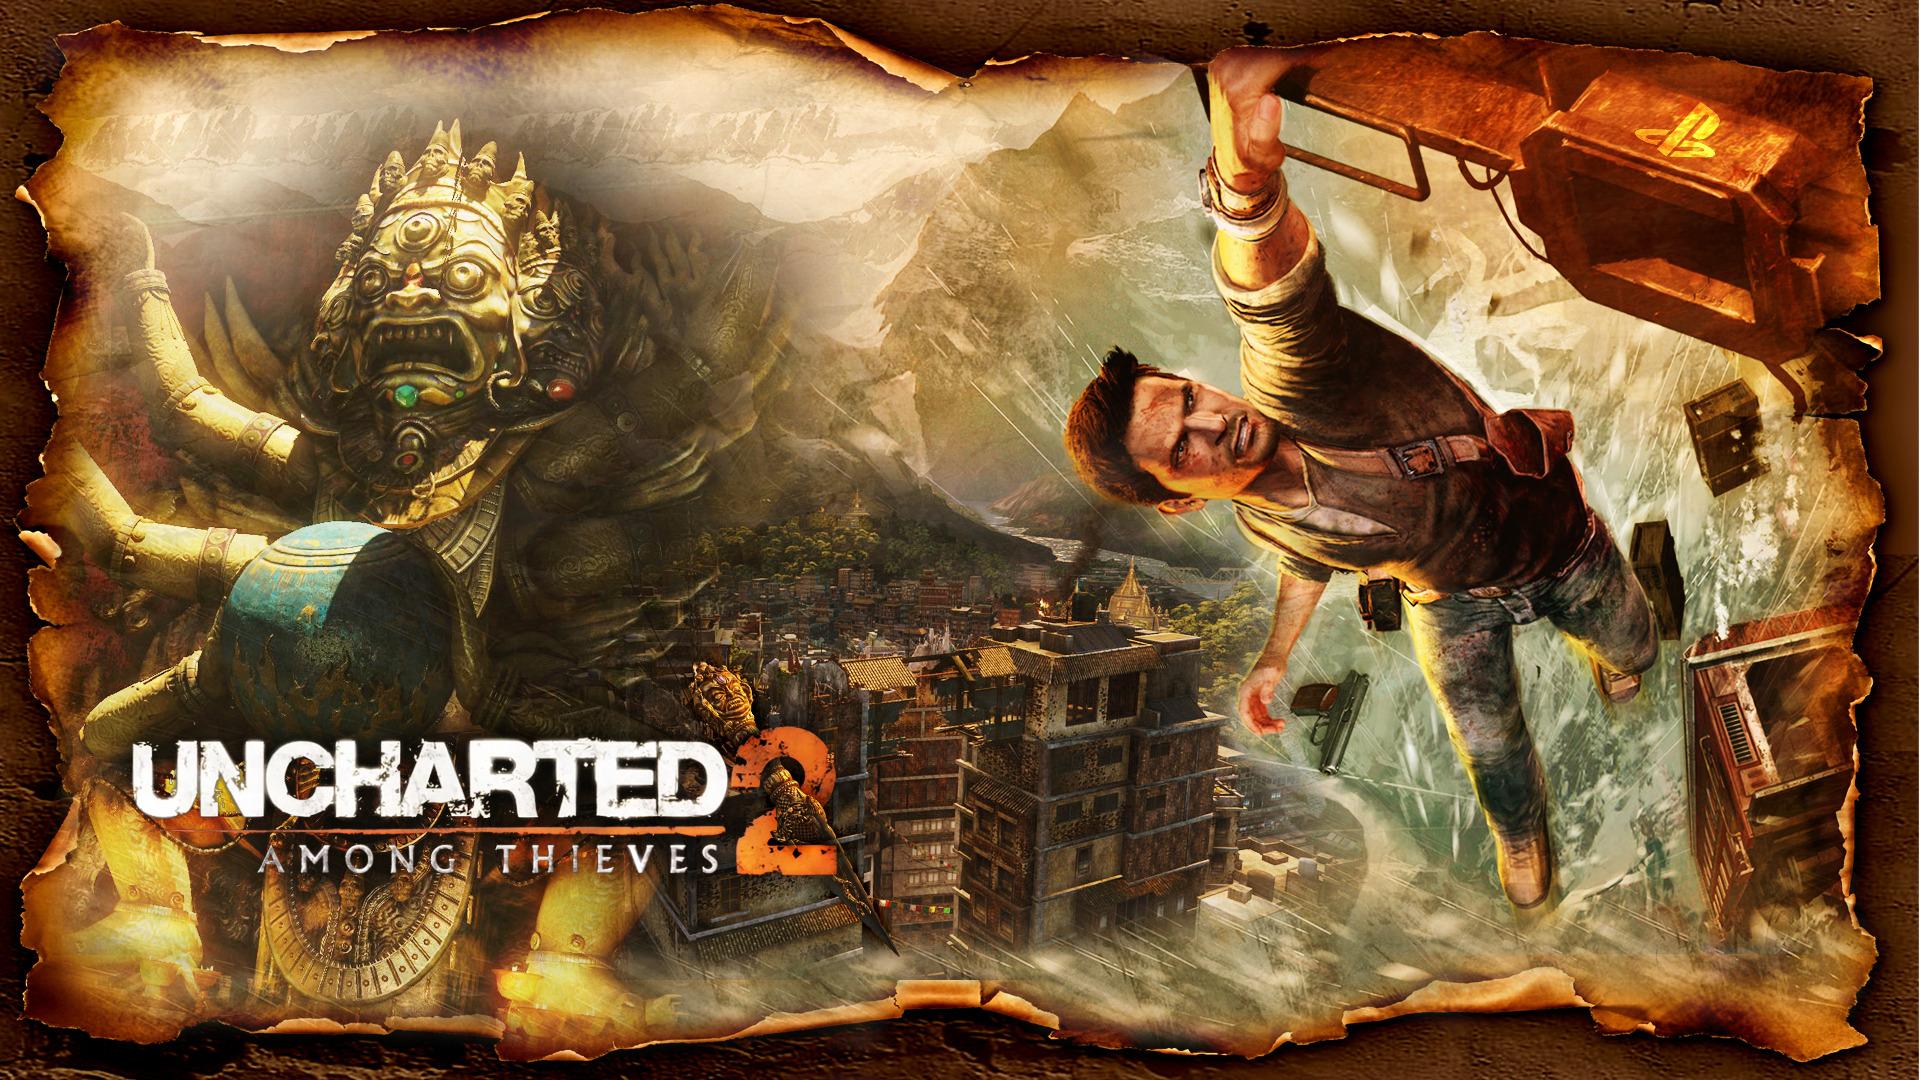 Fond dcran du jeu Uncharted 2 Among Thieves   1920x1080   28 04 1920x1080